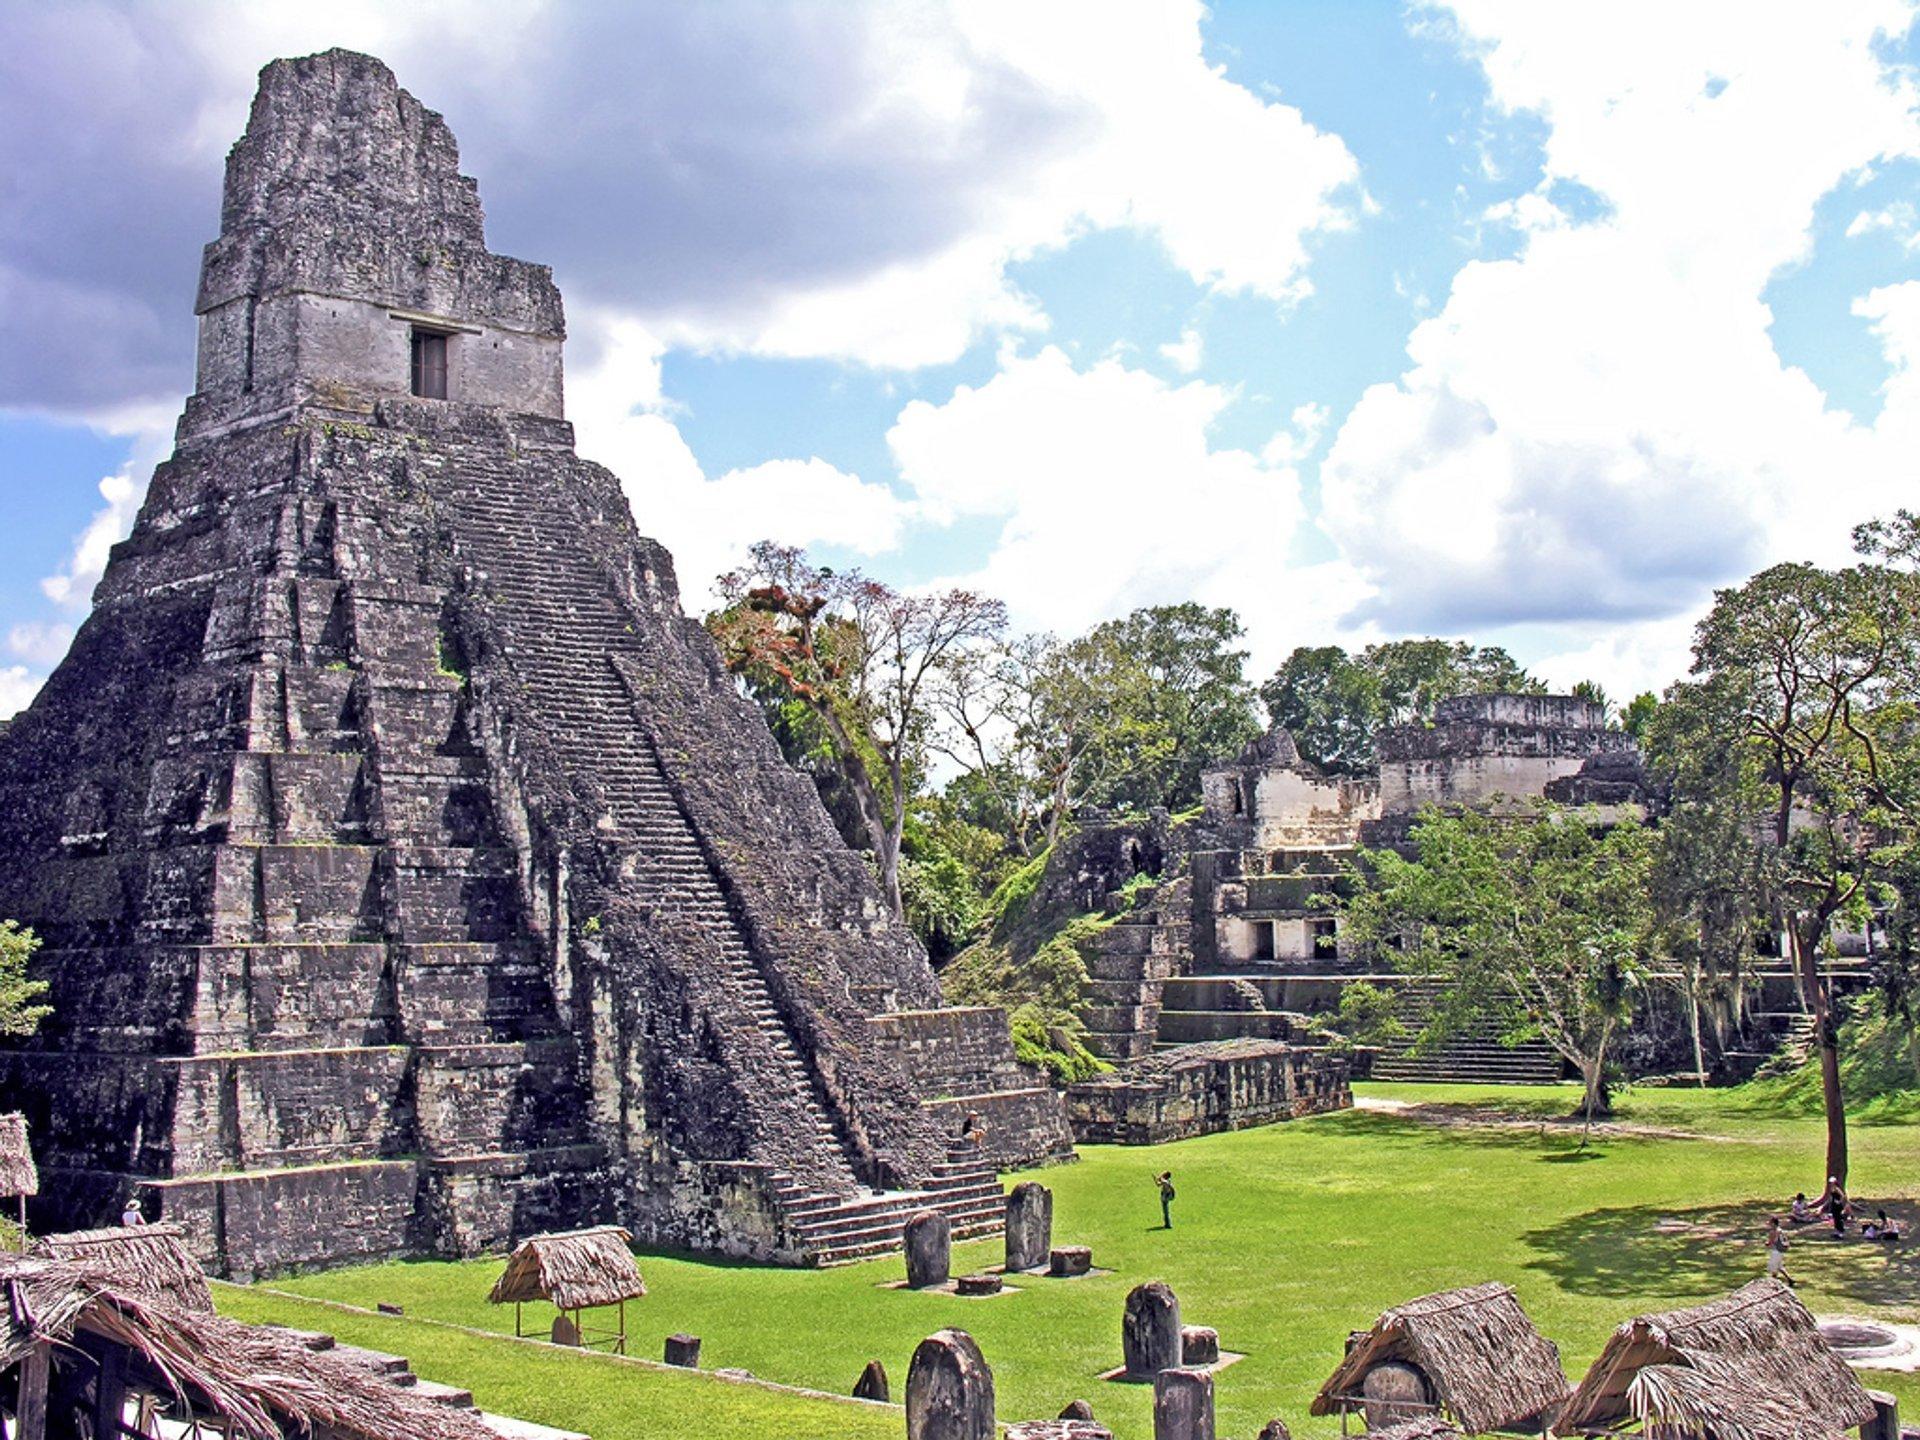 Tikal in Guatemala 2020 - Best Time